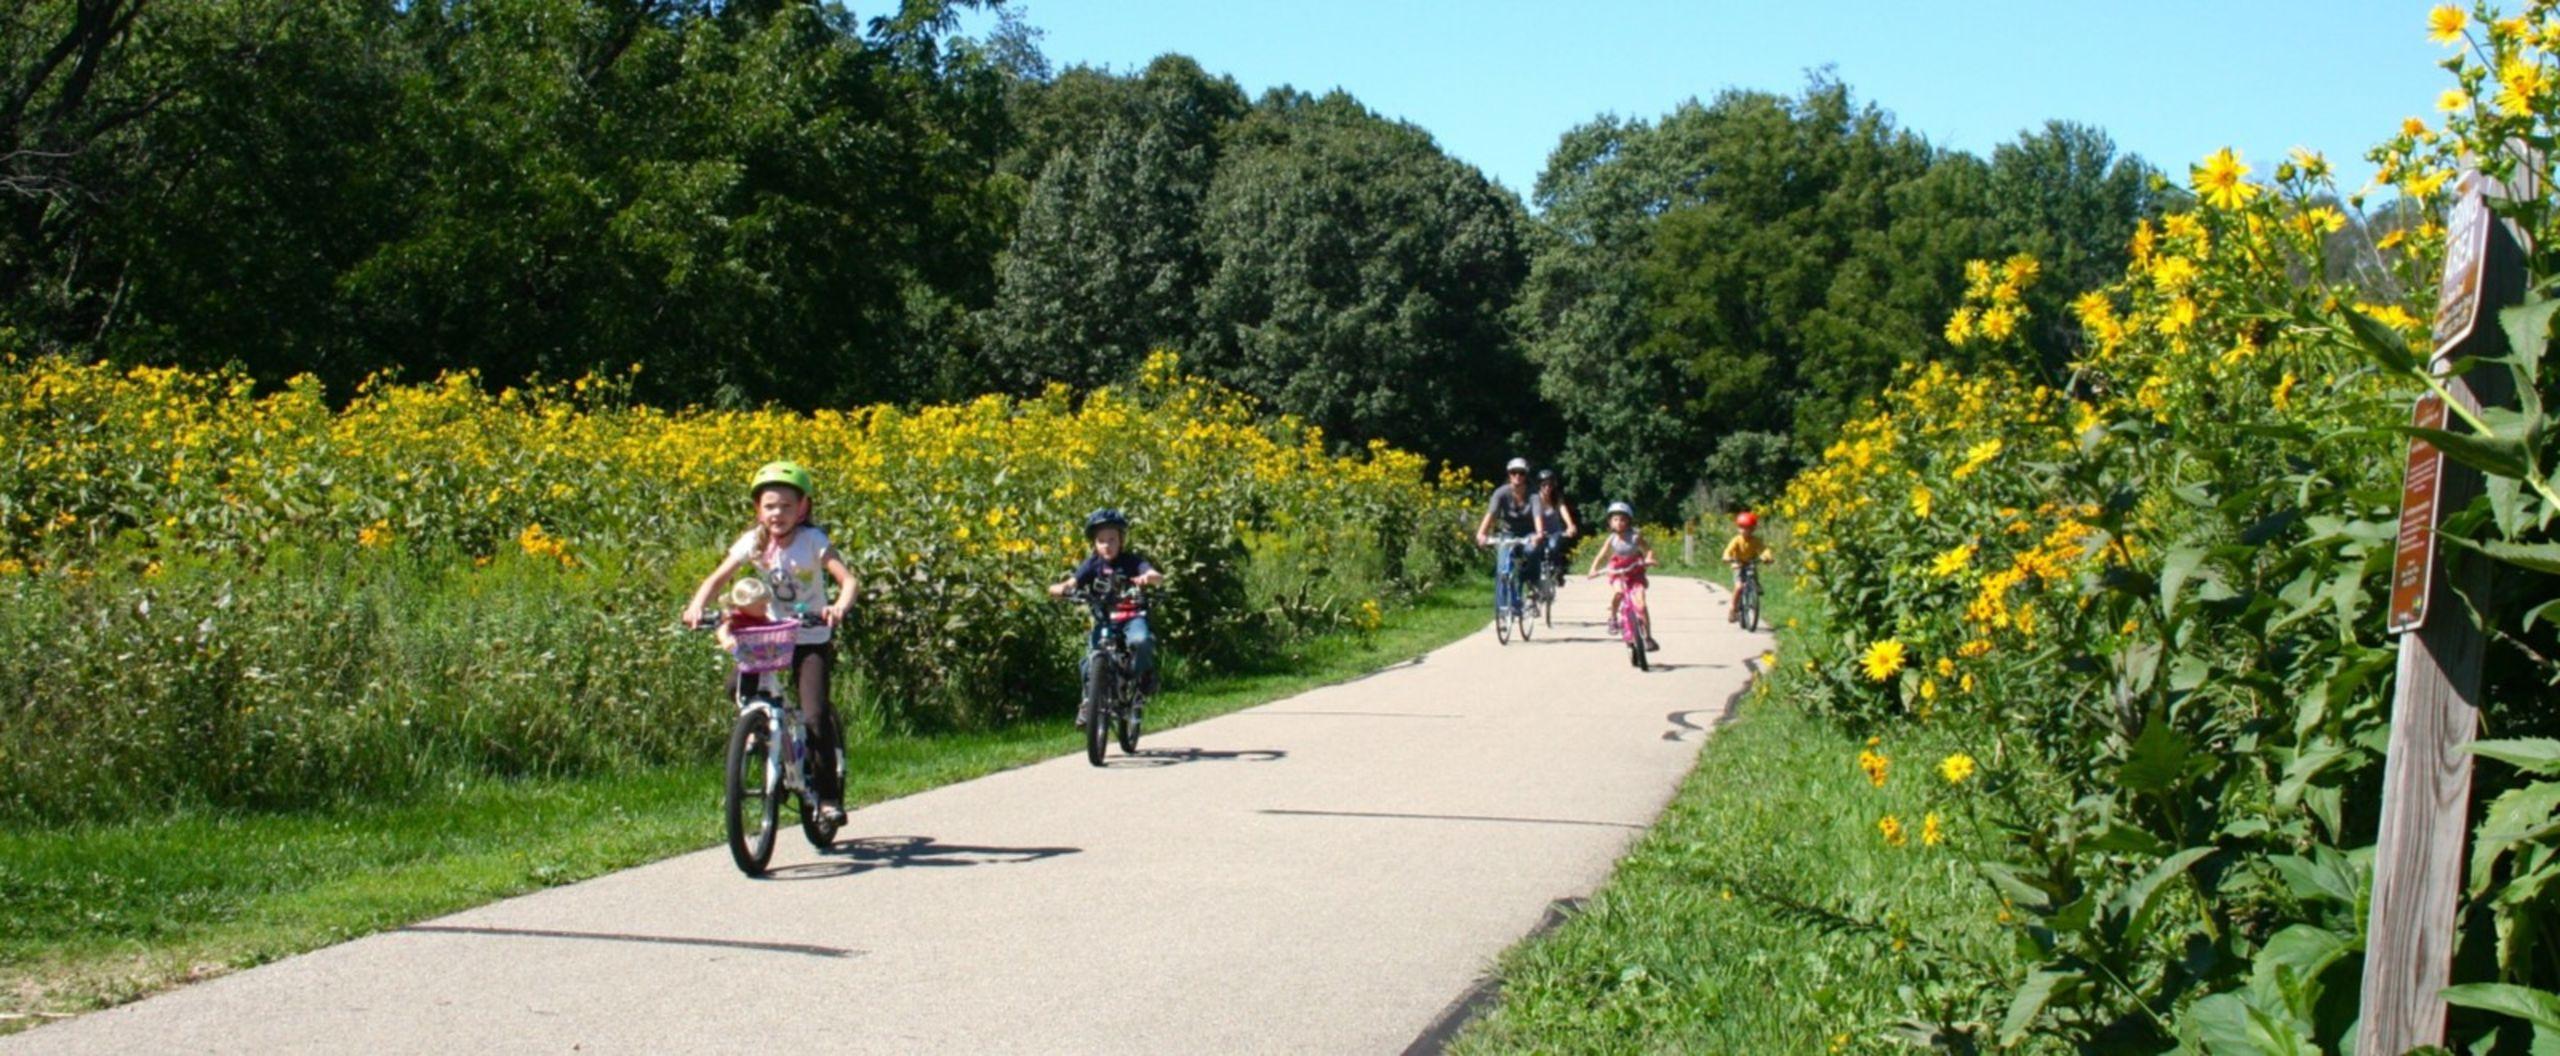 Bike-friendly communities.